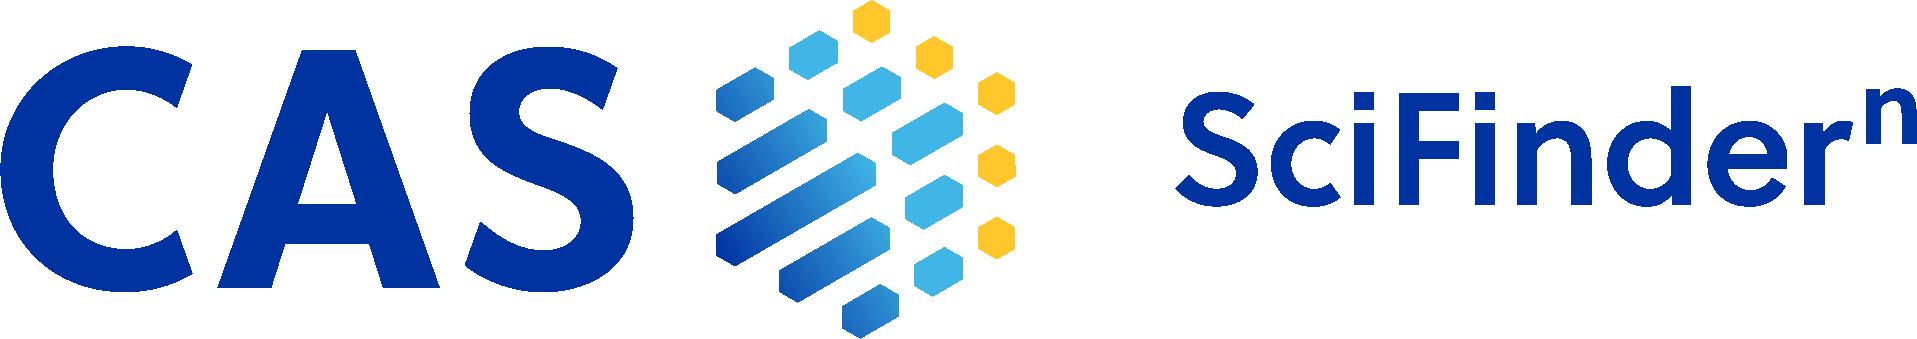 logo scifinder n horizontal